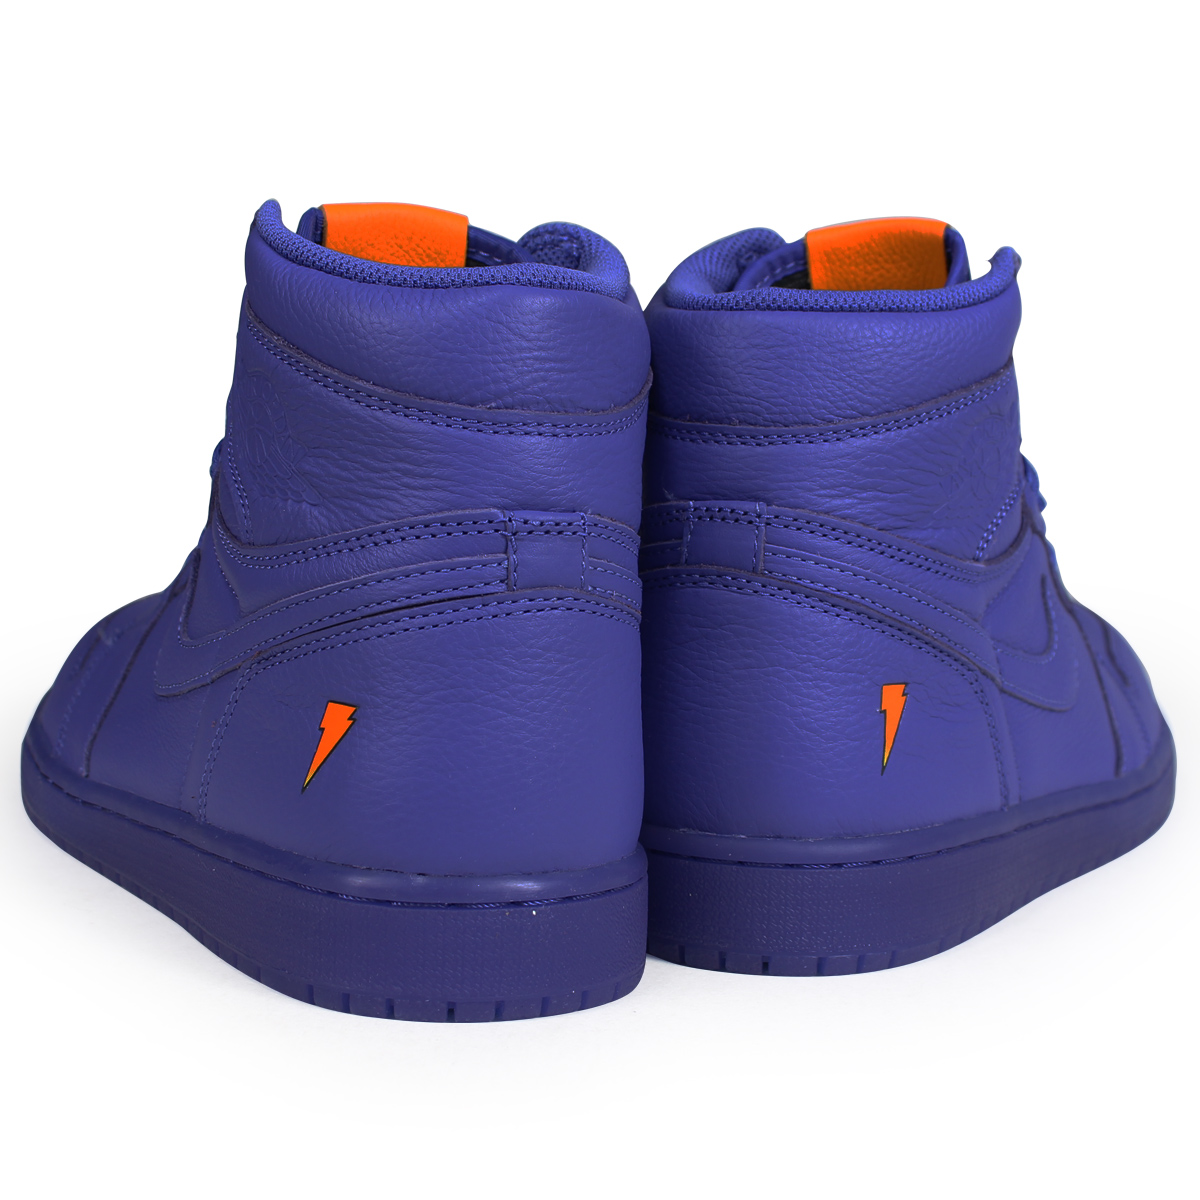 5532502b79a2 NIKE Nike Air Jordan 1 nostalgic high sneakers men AIR JORDAN 1 RETRO HIGH  OG G8RD BE LIKE MIKE GRAPE AJ5997-555 blue